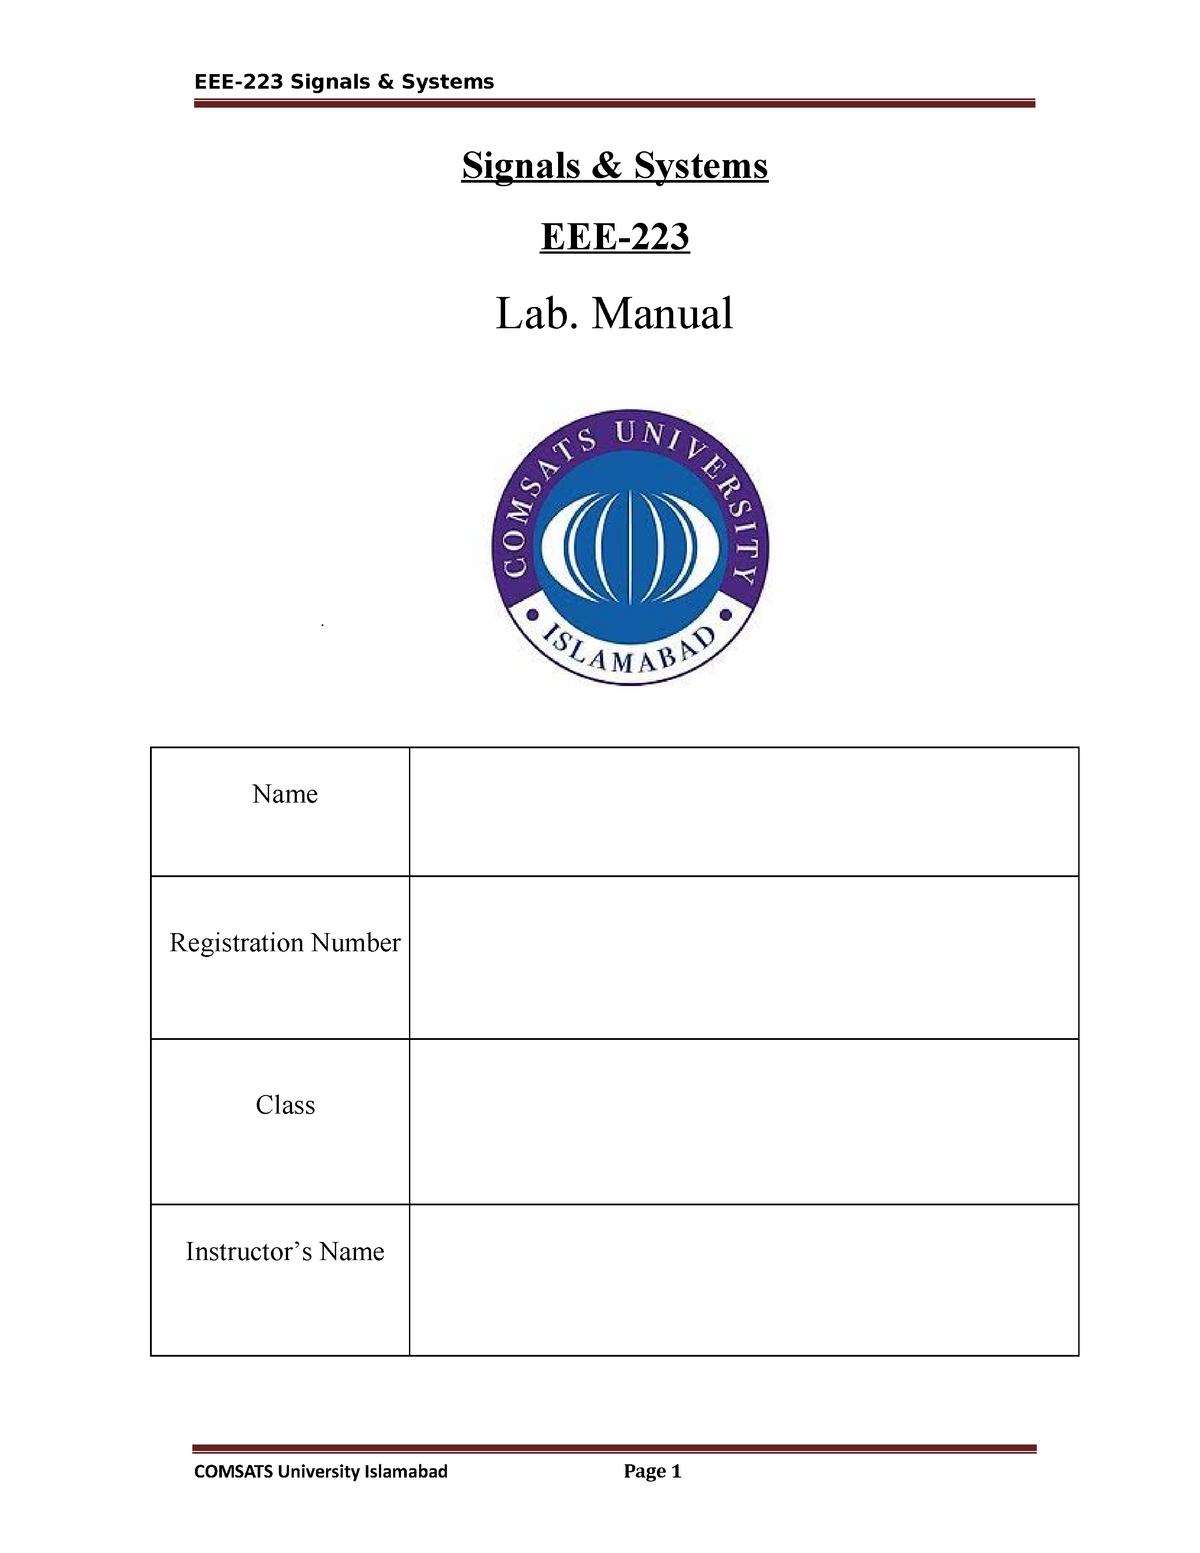 Sample psychology research paper apa format